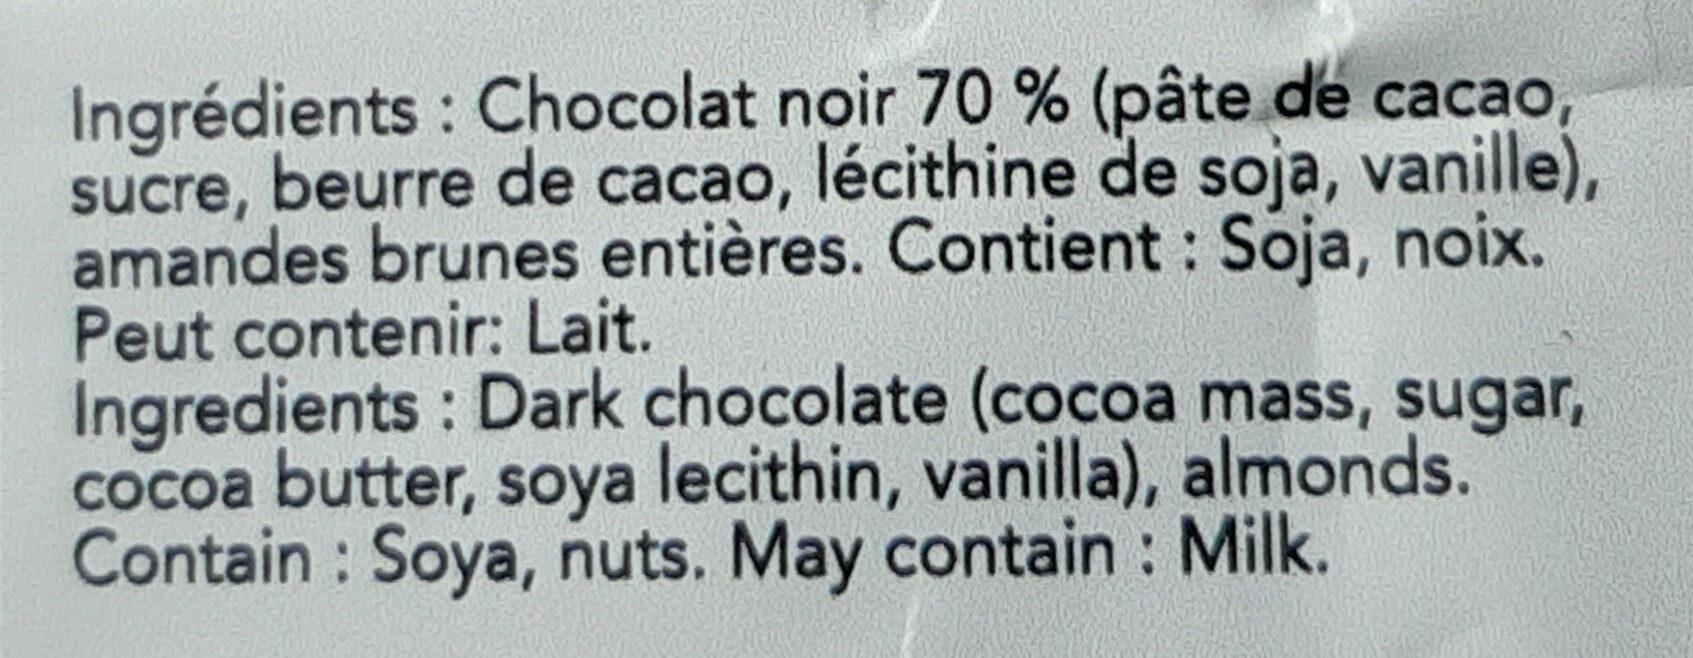 Brisures de chocolat noir 70% - Ingredients - fr